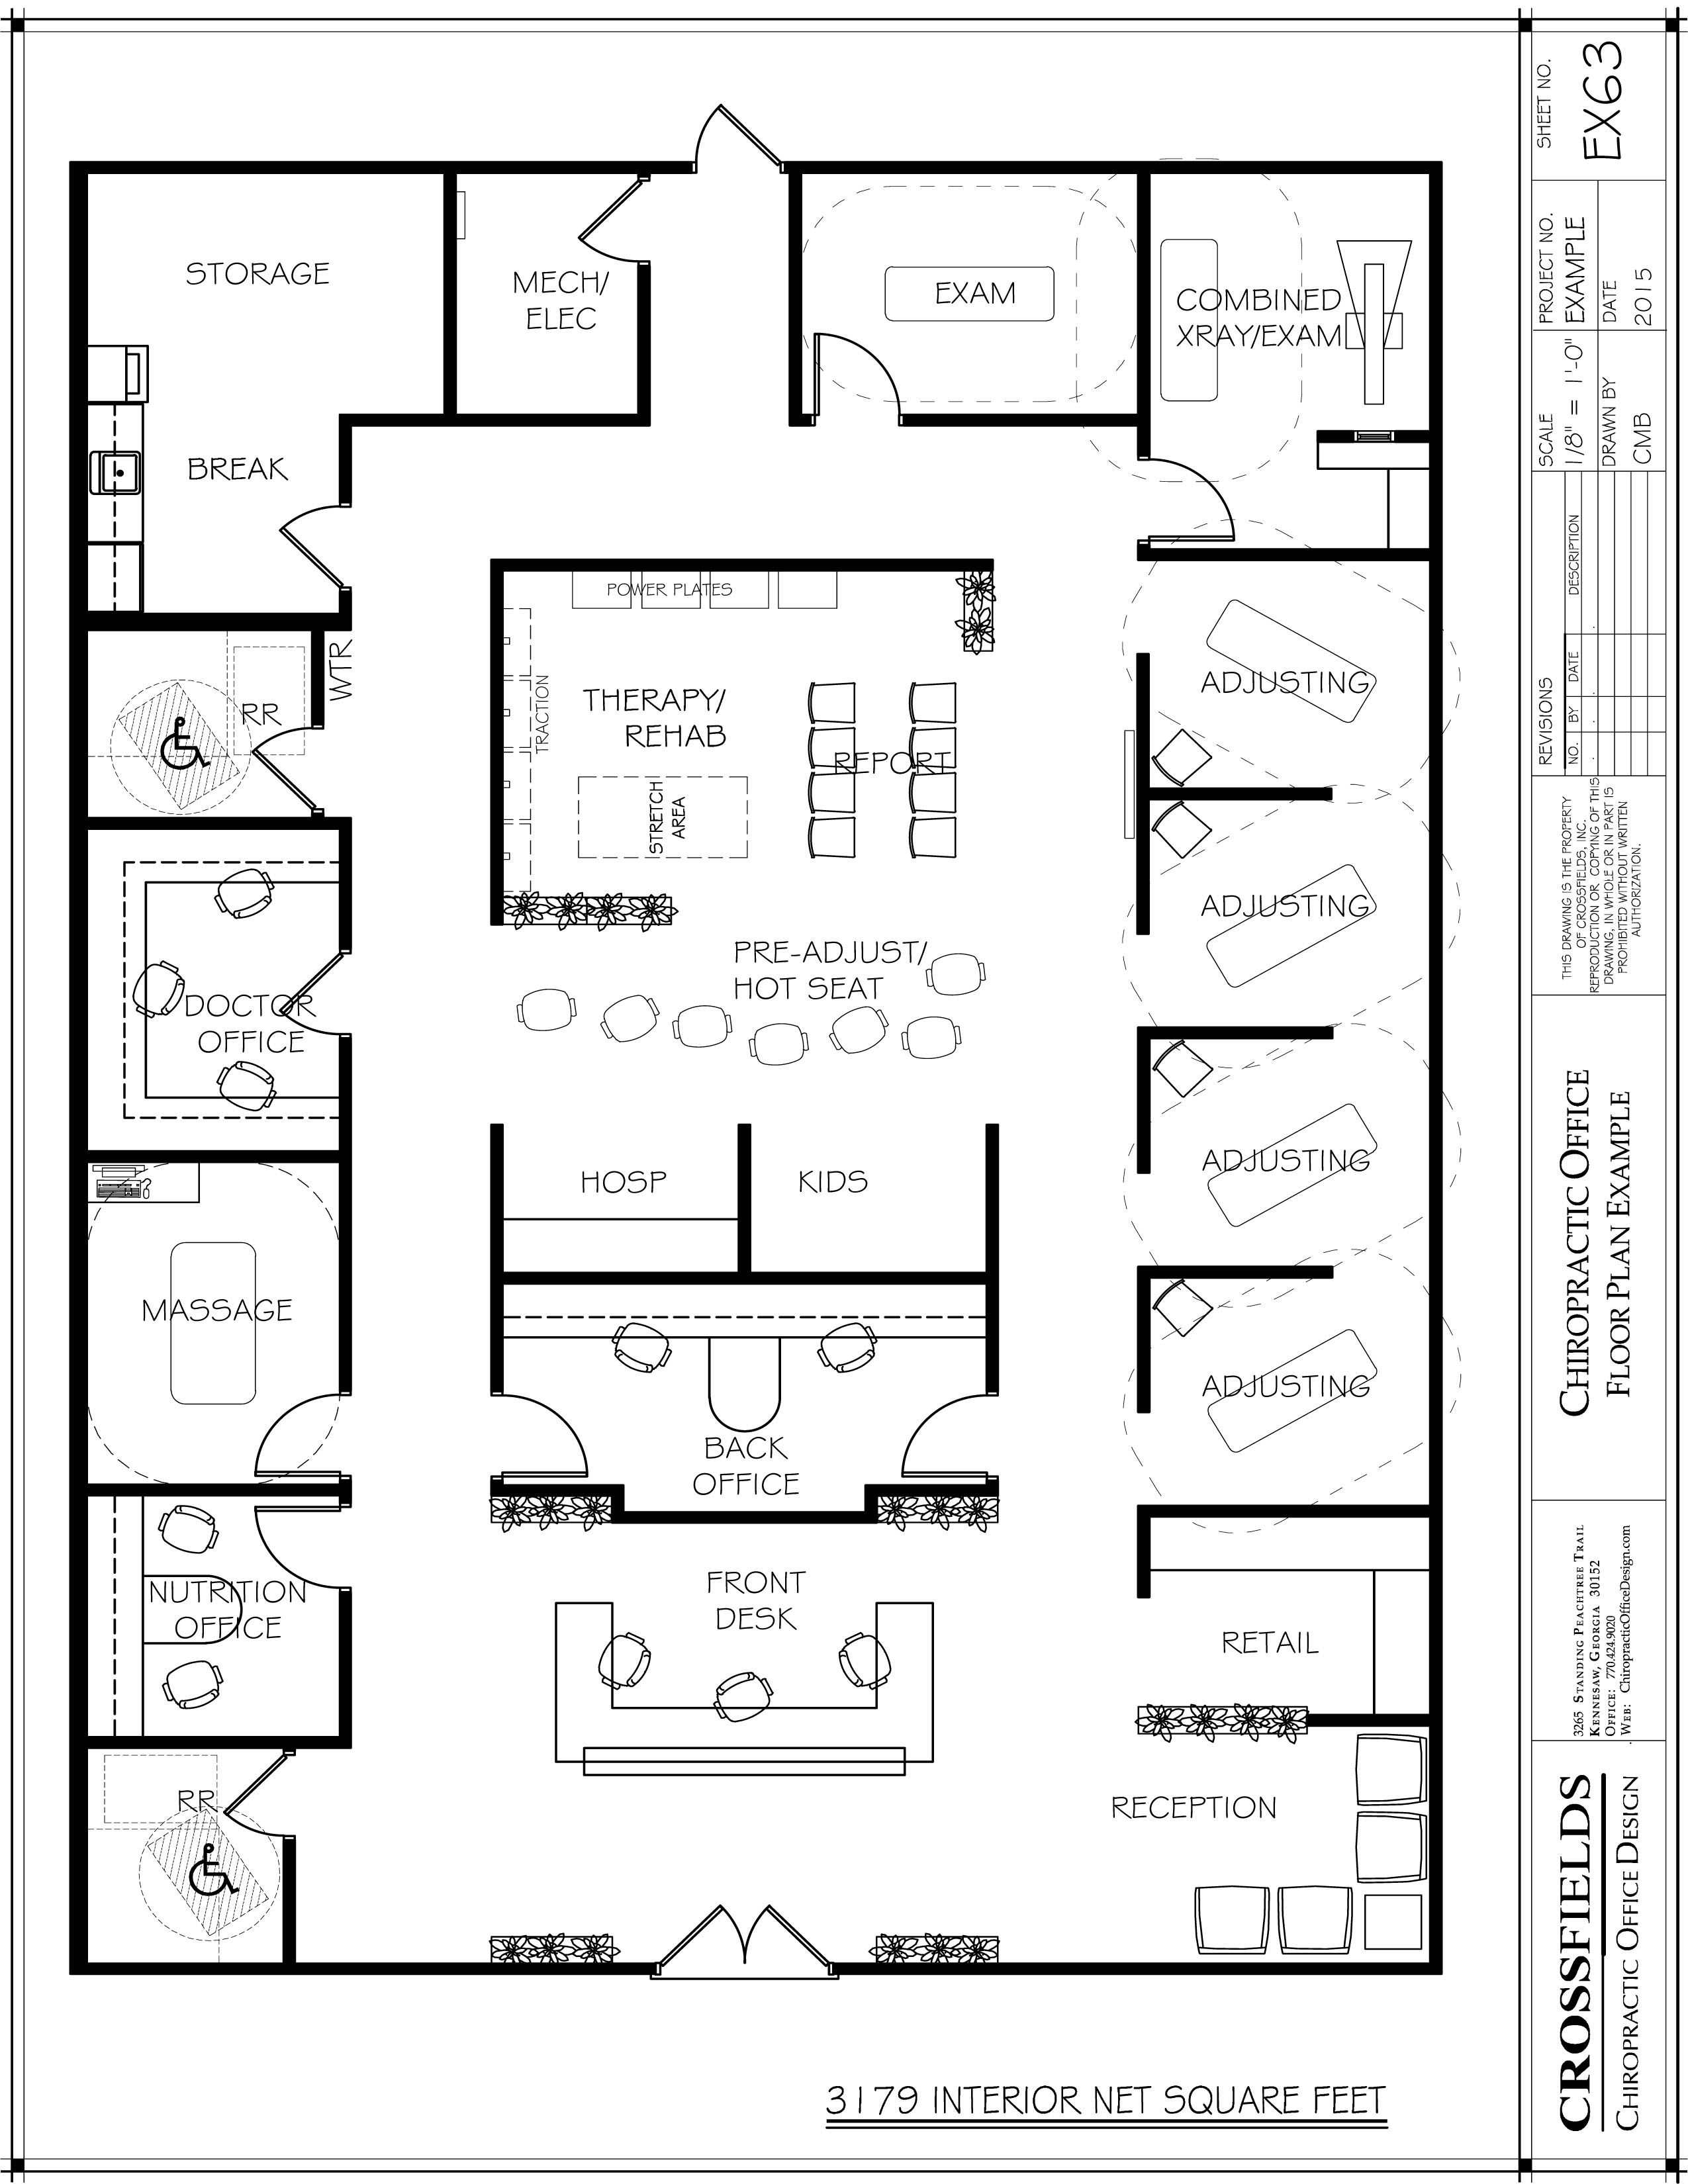 medium resolution of clinic layout diagrams wiring diagram blogclinic layout diagrams wiring diagram chiropractic office floor plans versatile medical